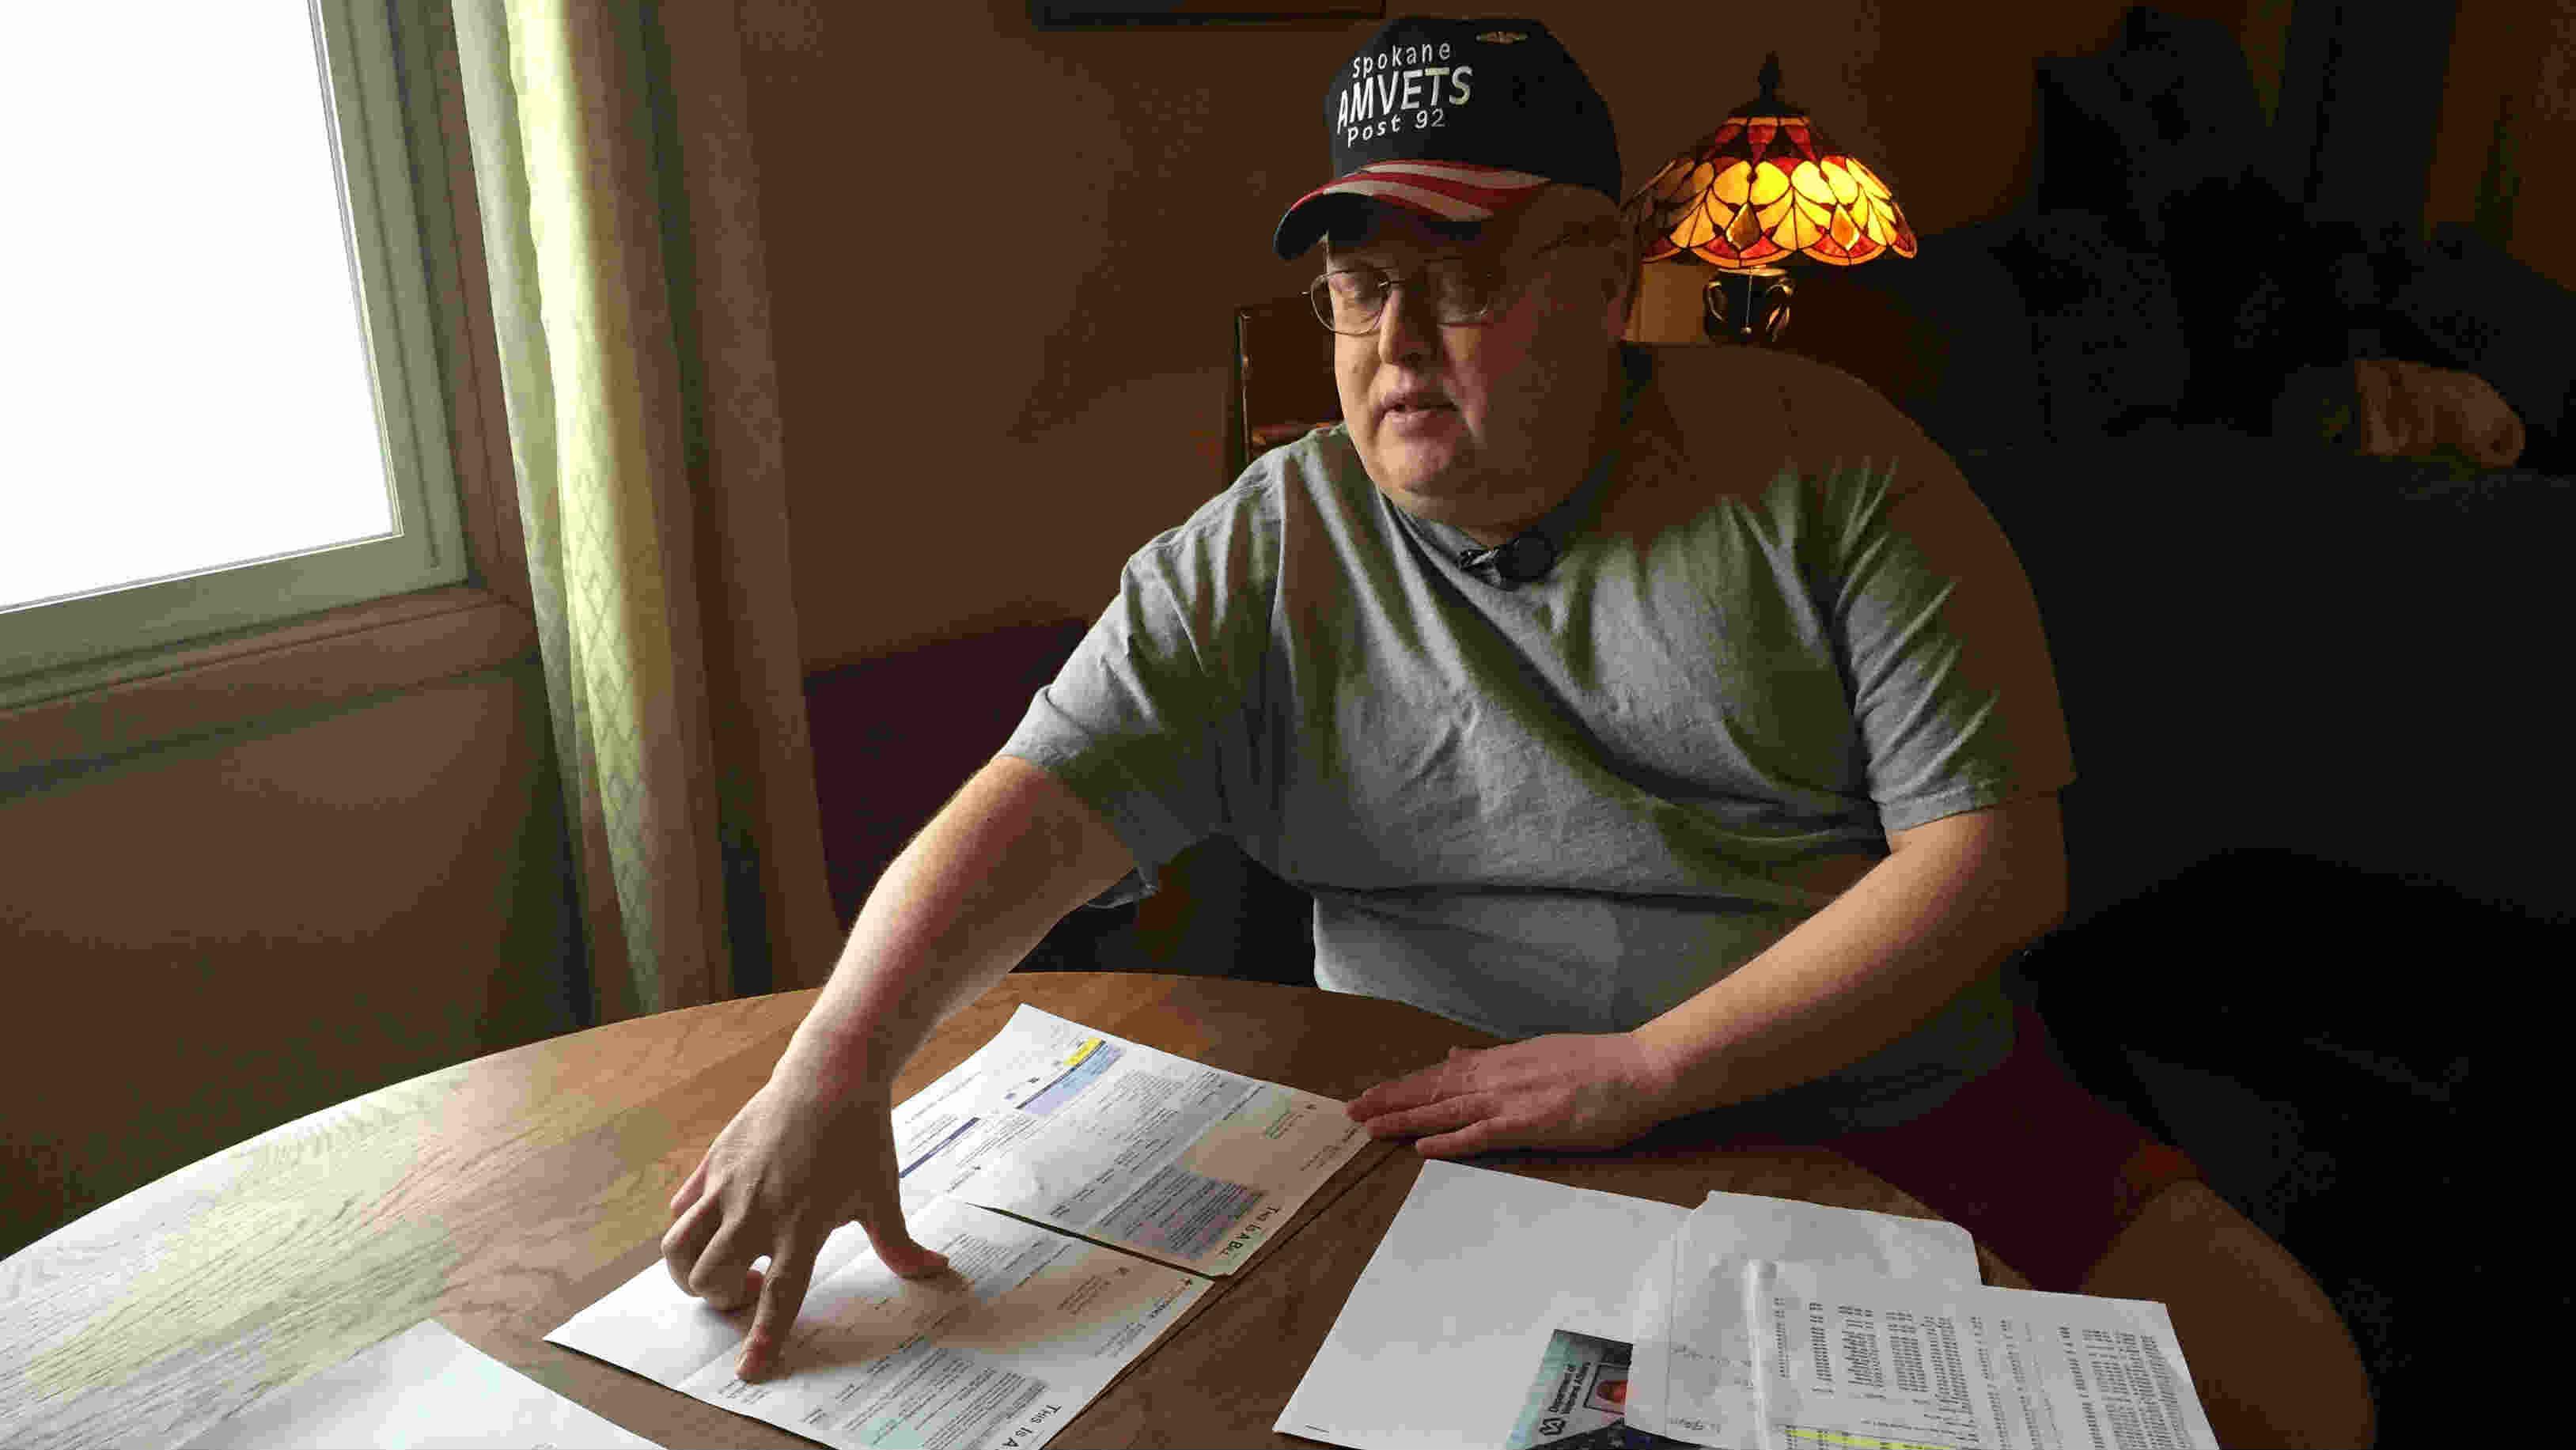 Reopening Spokane VA Emergency Room for 24-7 service at risk